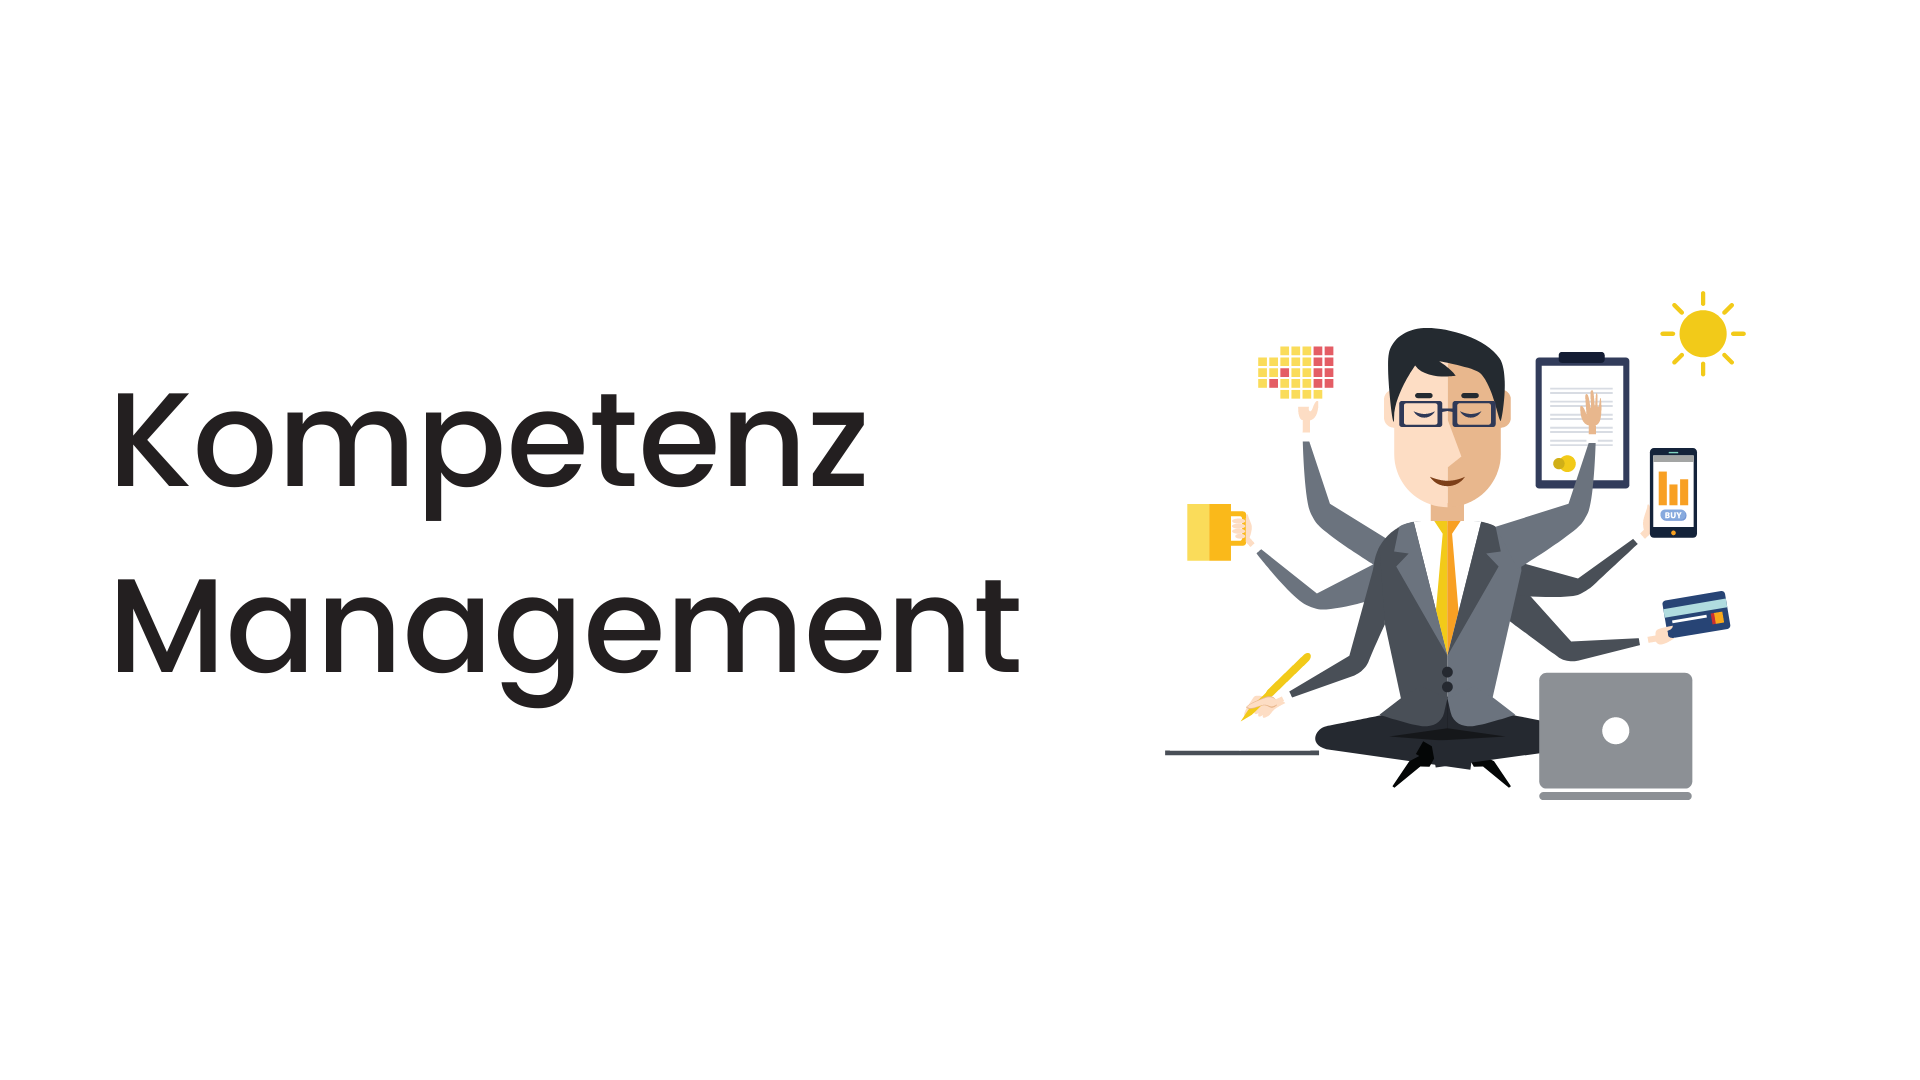 Digital_Coach_Academy_Personal_Branding_Architect_Kompetenz_Management